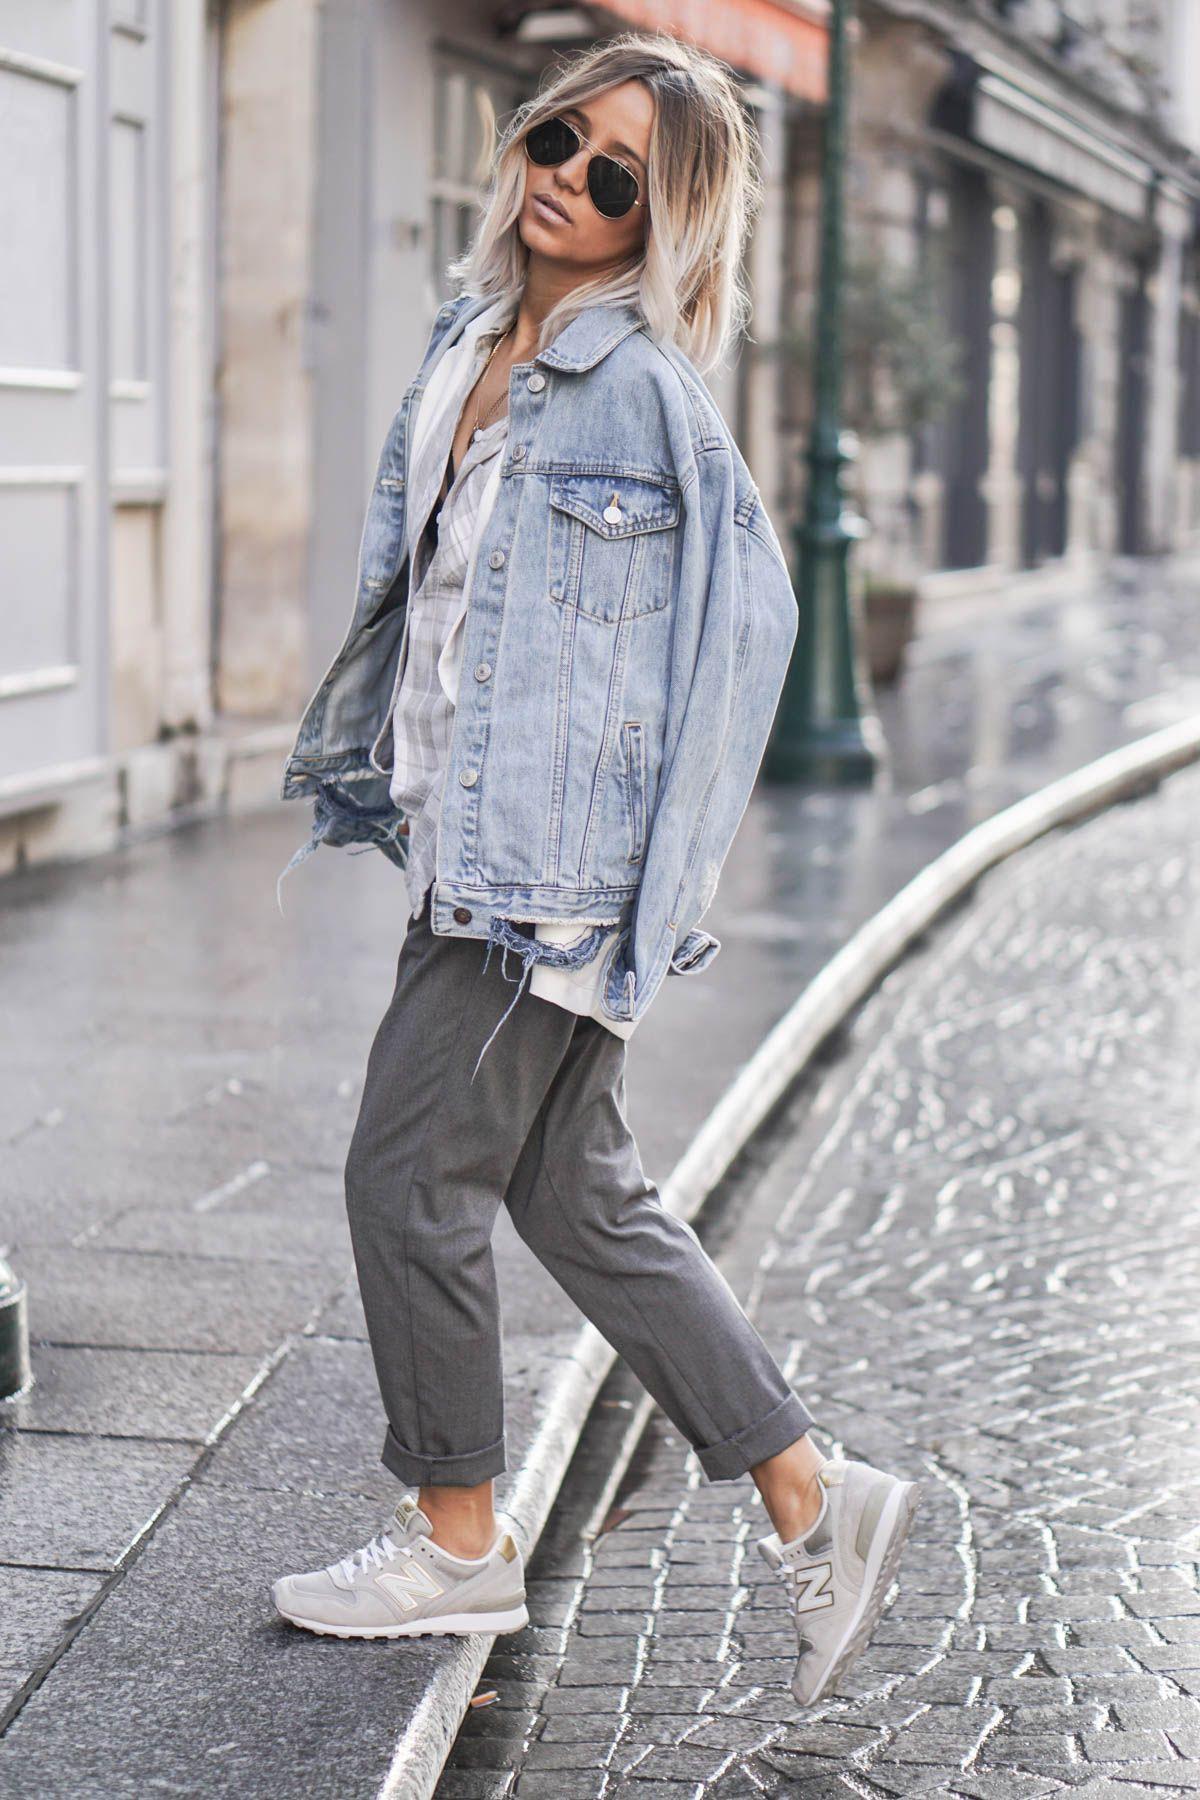 Oversized denim jacket outfit, street fashion, casual wear, jean jacket, t shirt